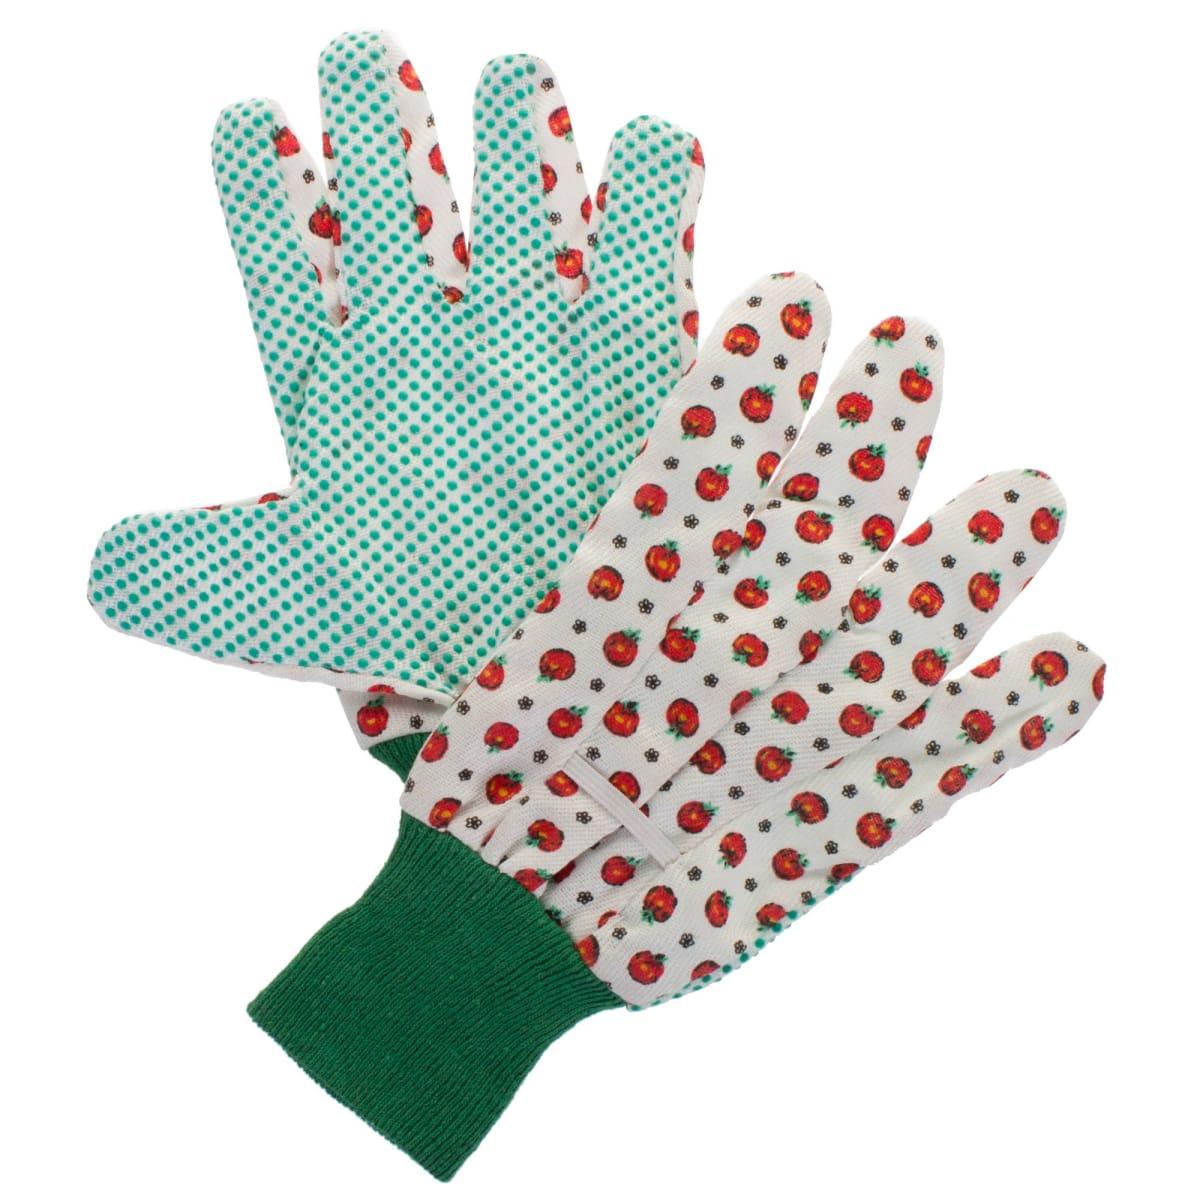 Перчатки садовые с рисунком hx-33-M,  х/б-ПВХ